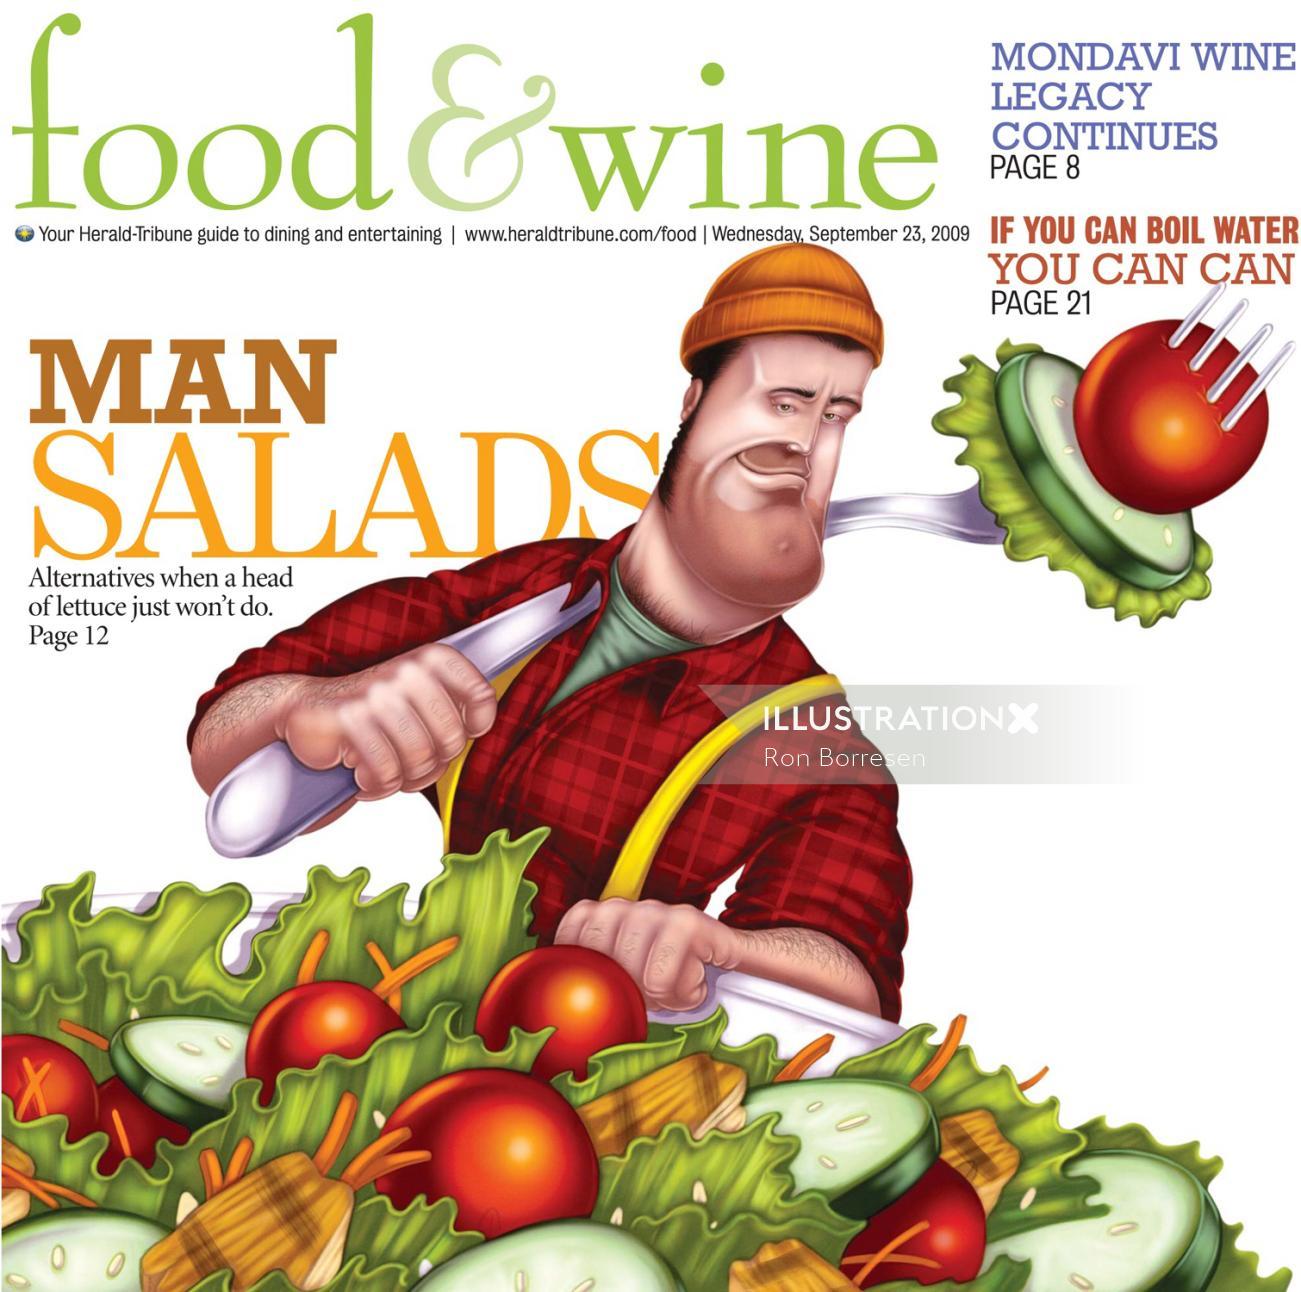 Food & diet man salads poster